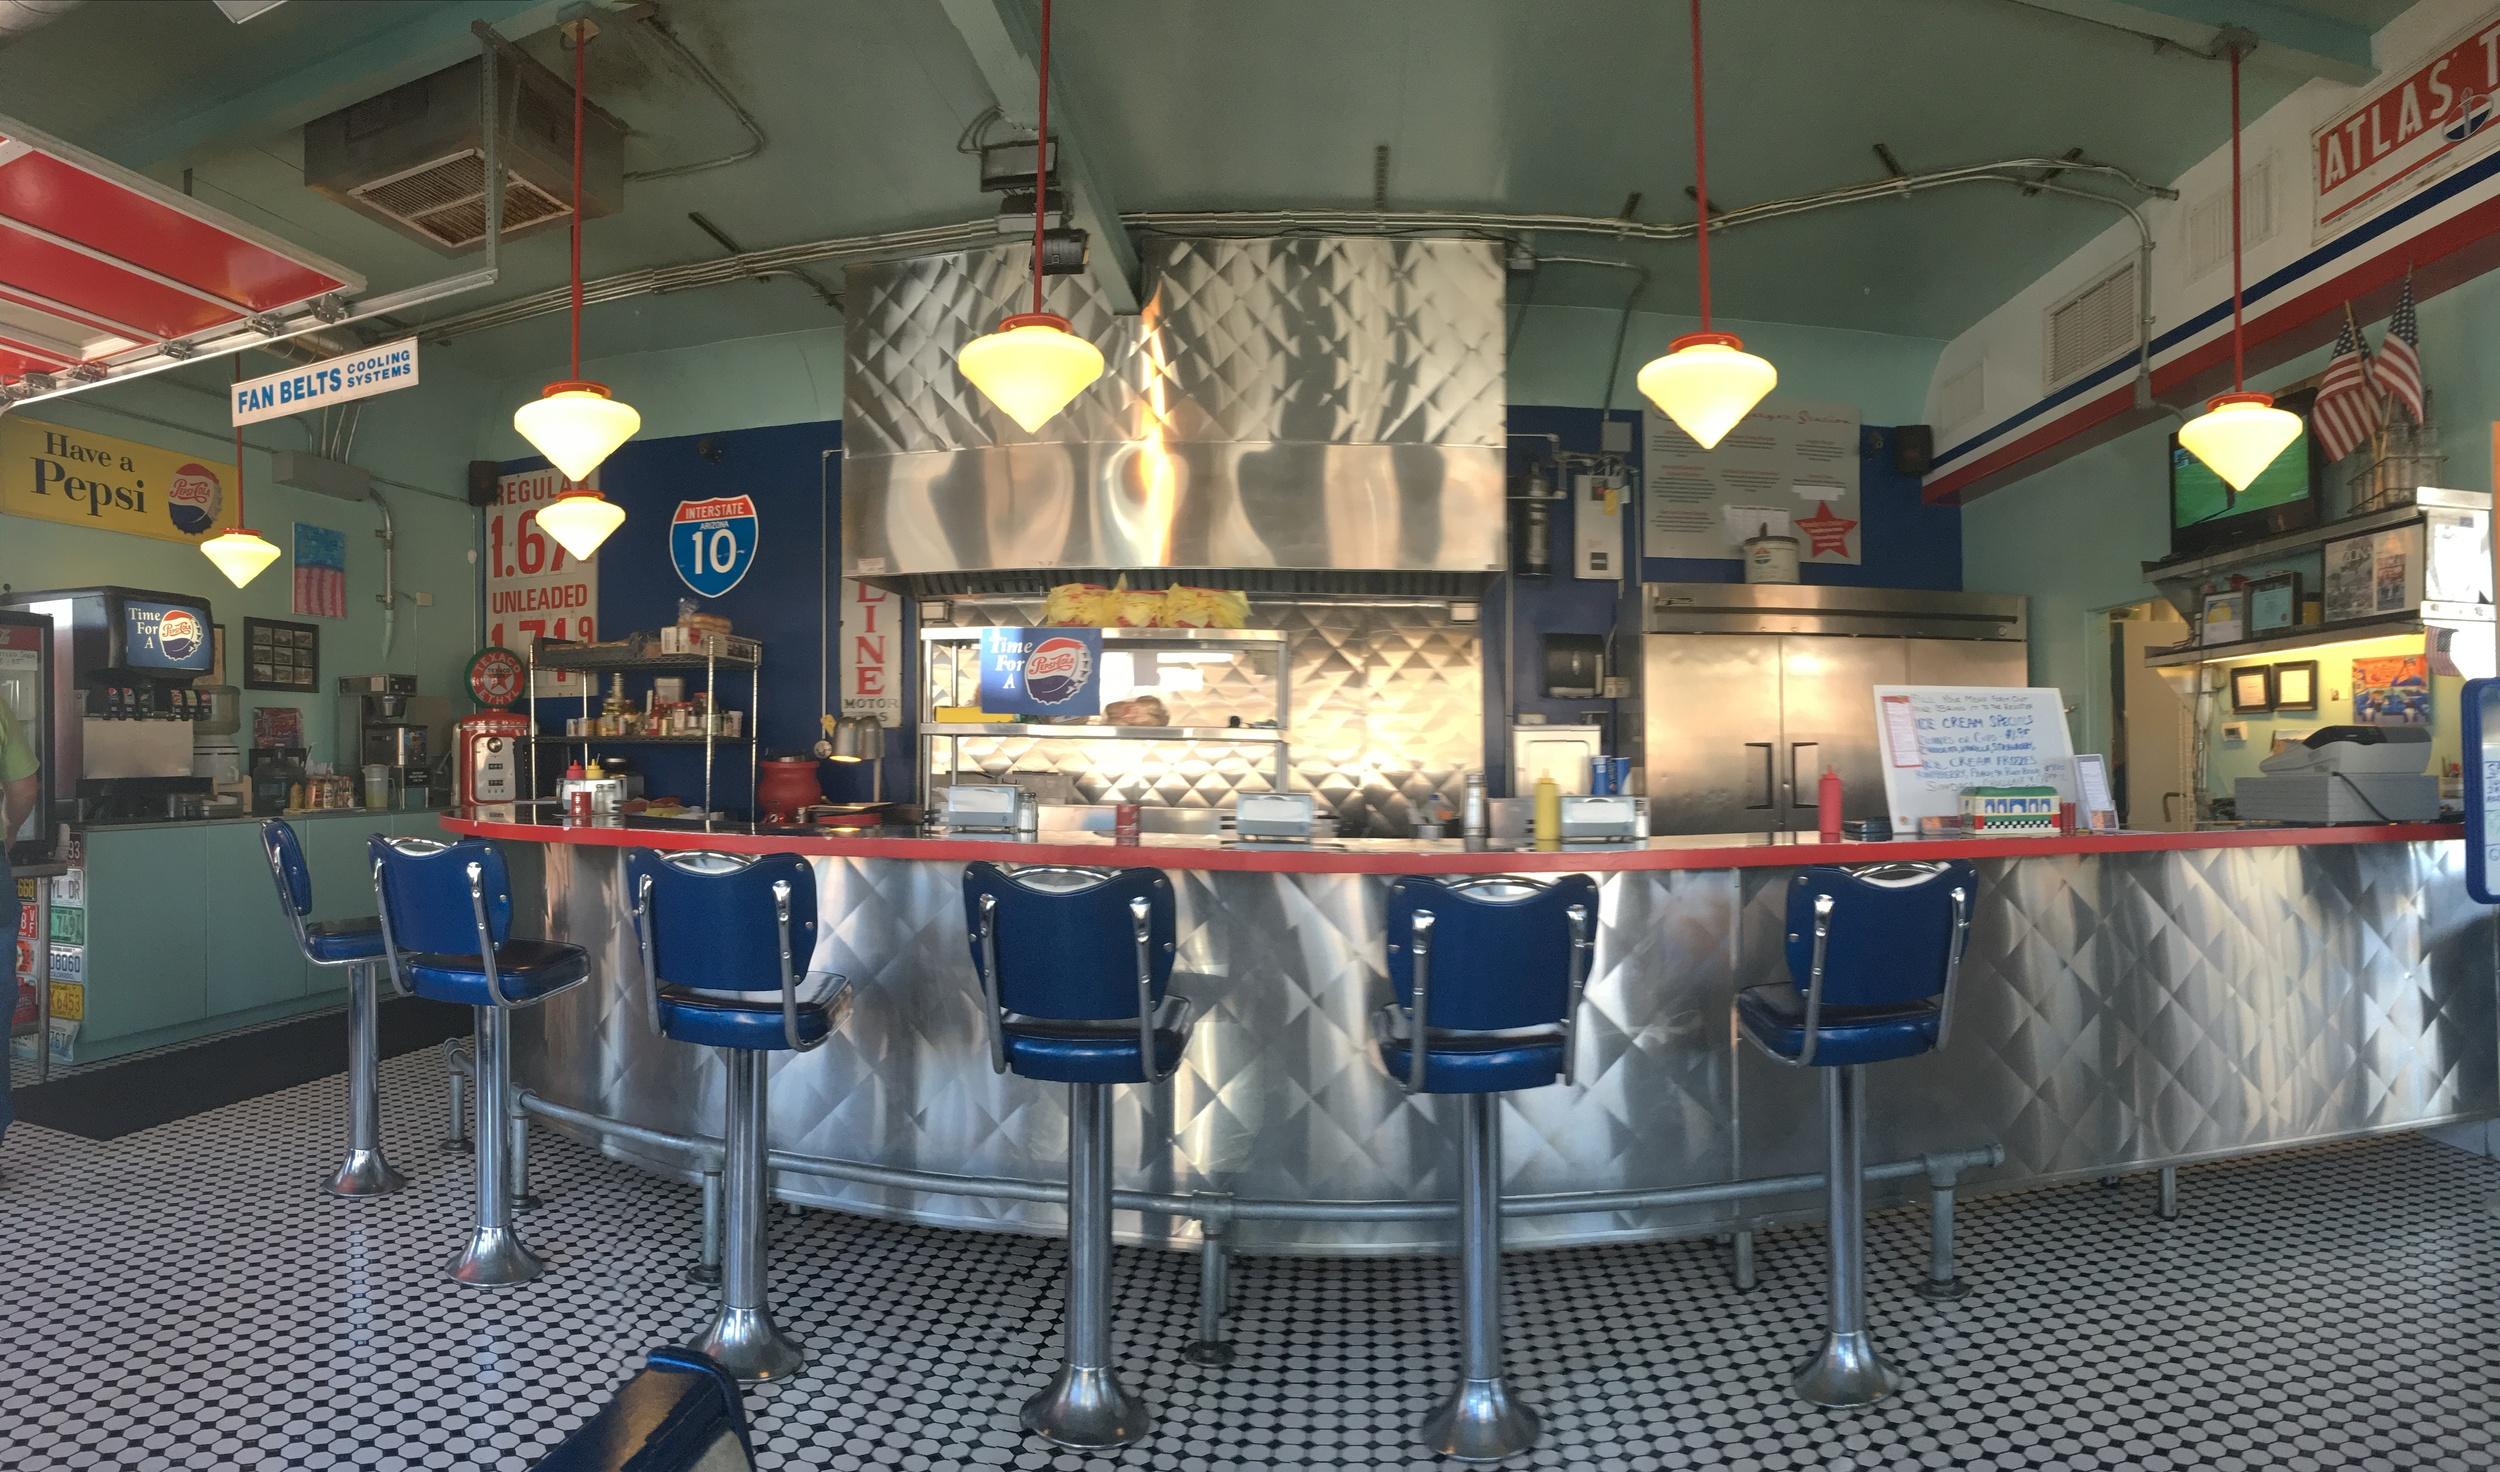 Bing's Burger Station Jon Courville